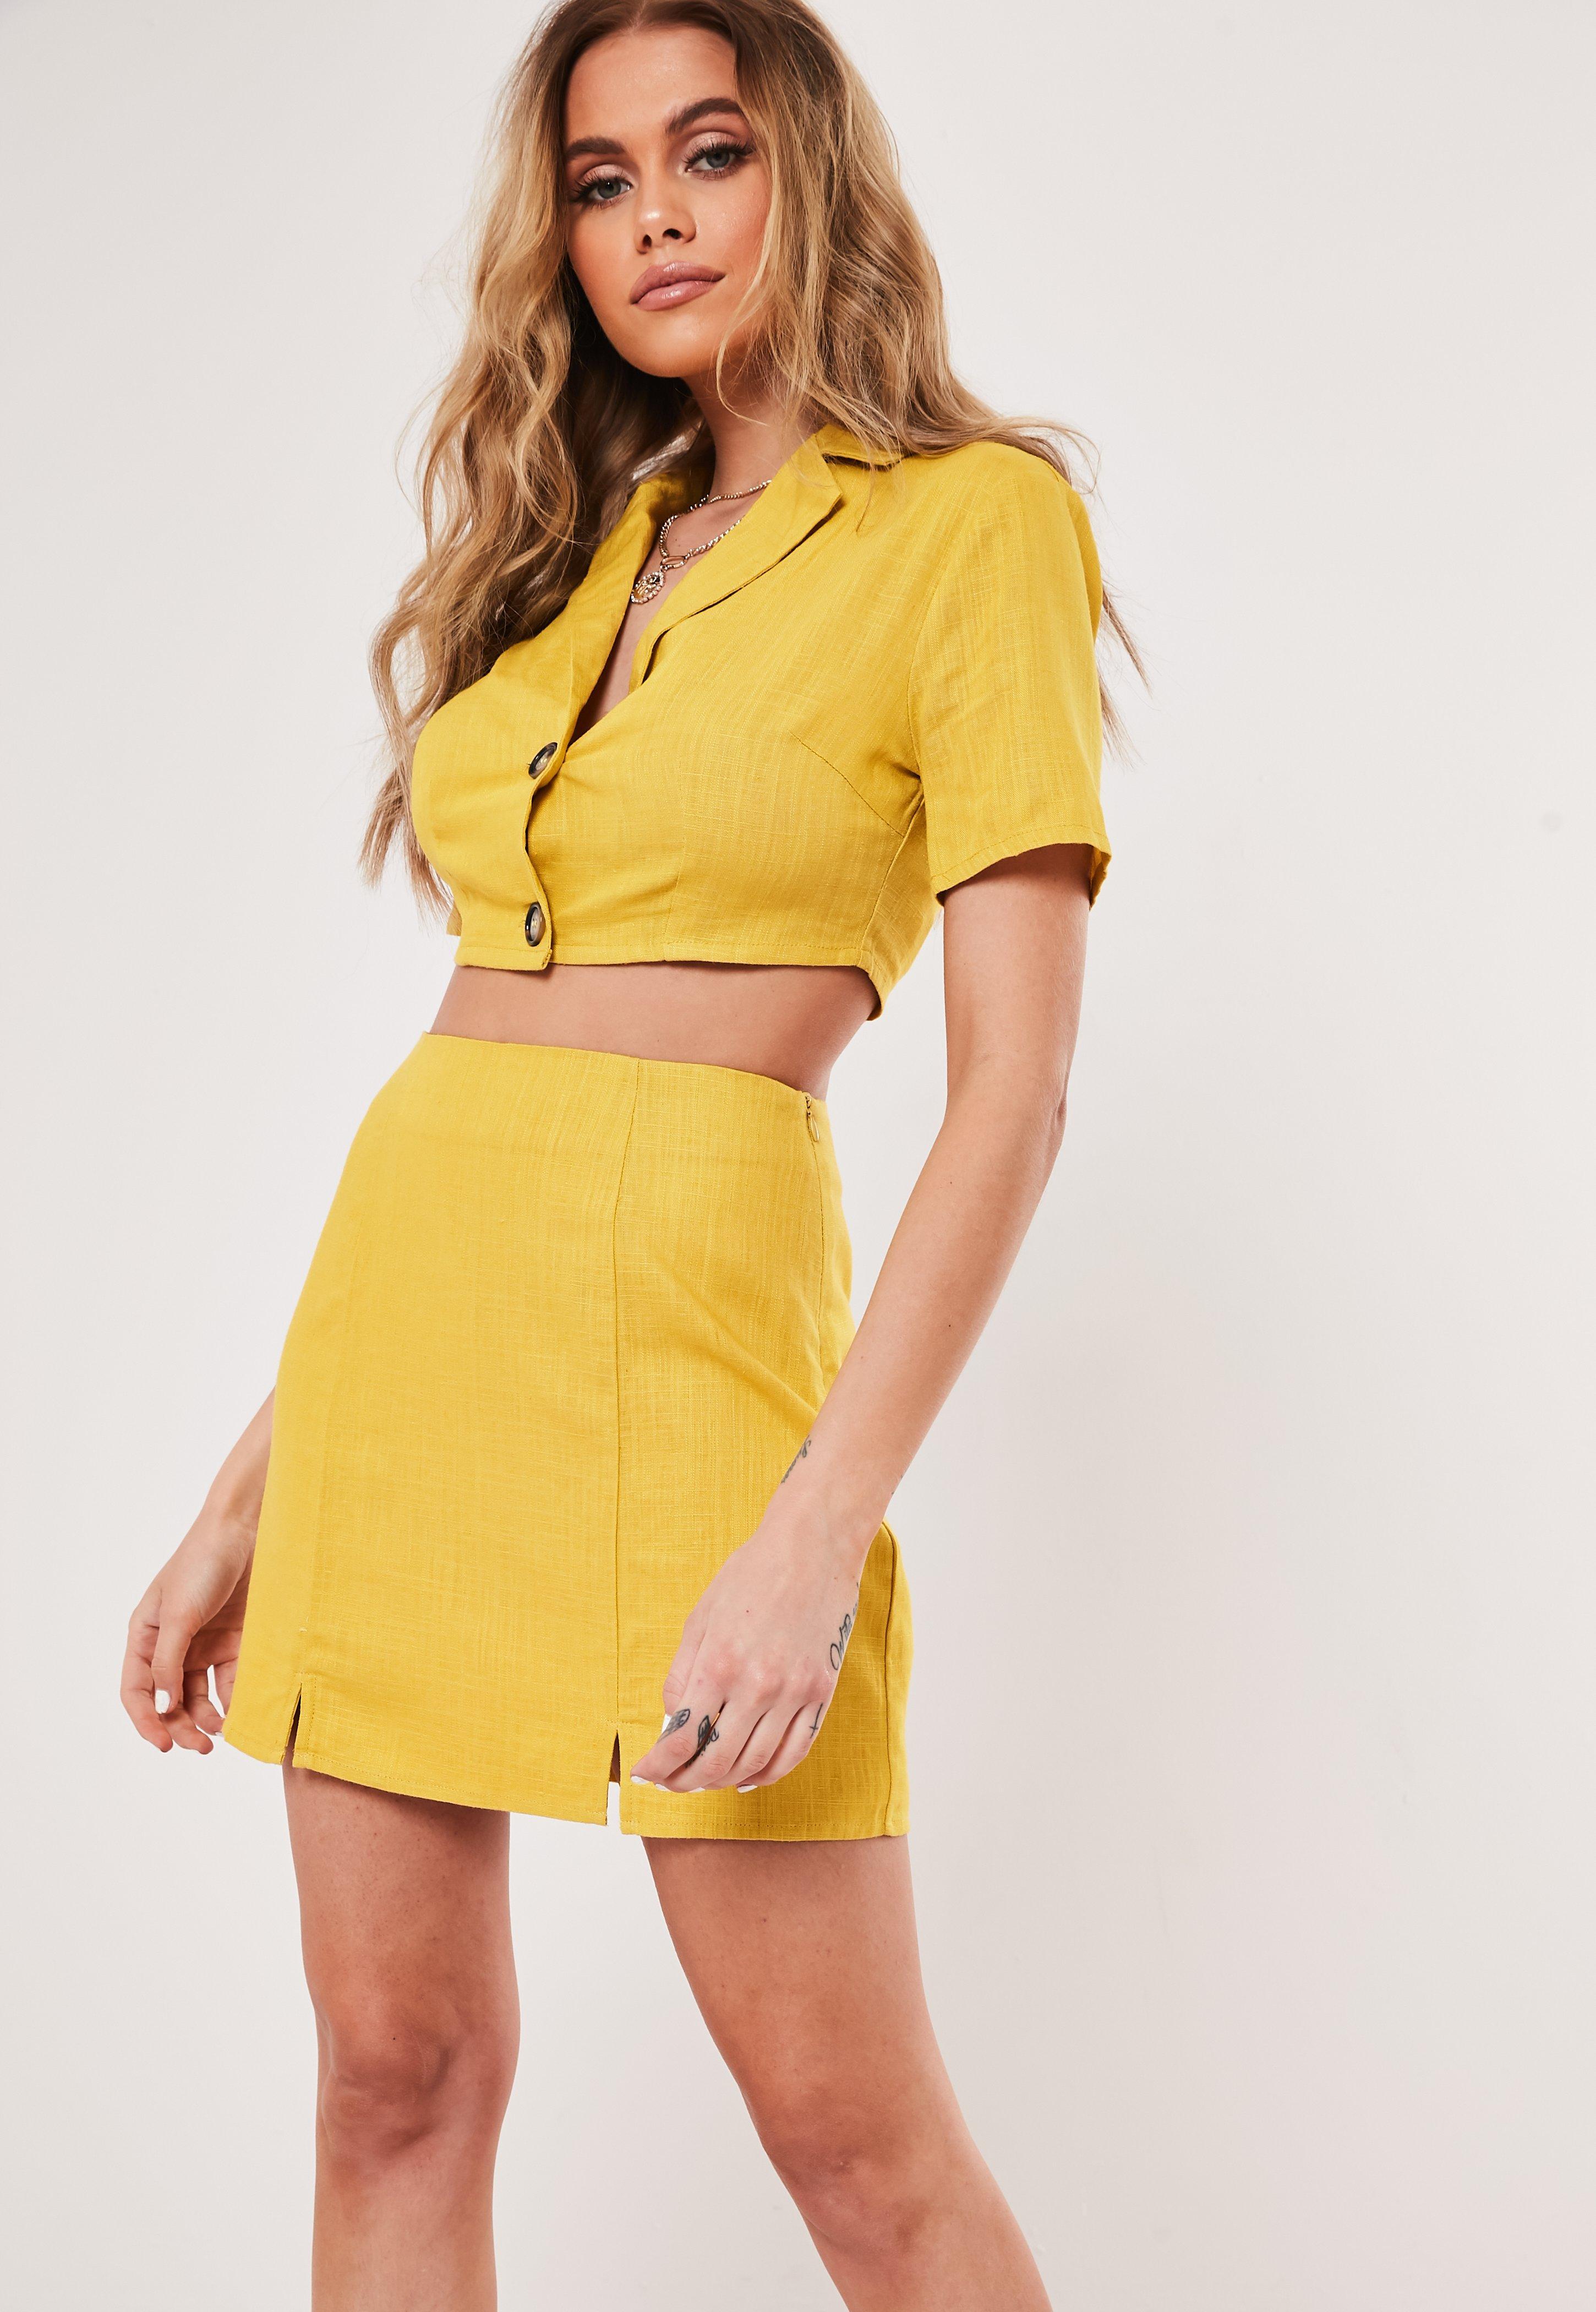 Pics of short skirts